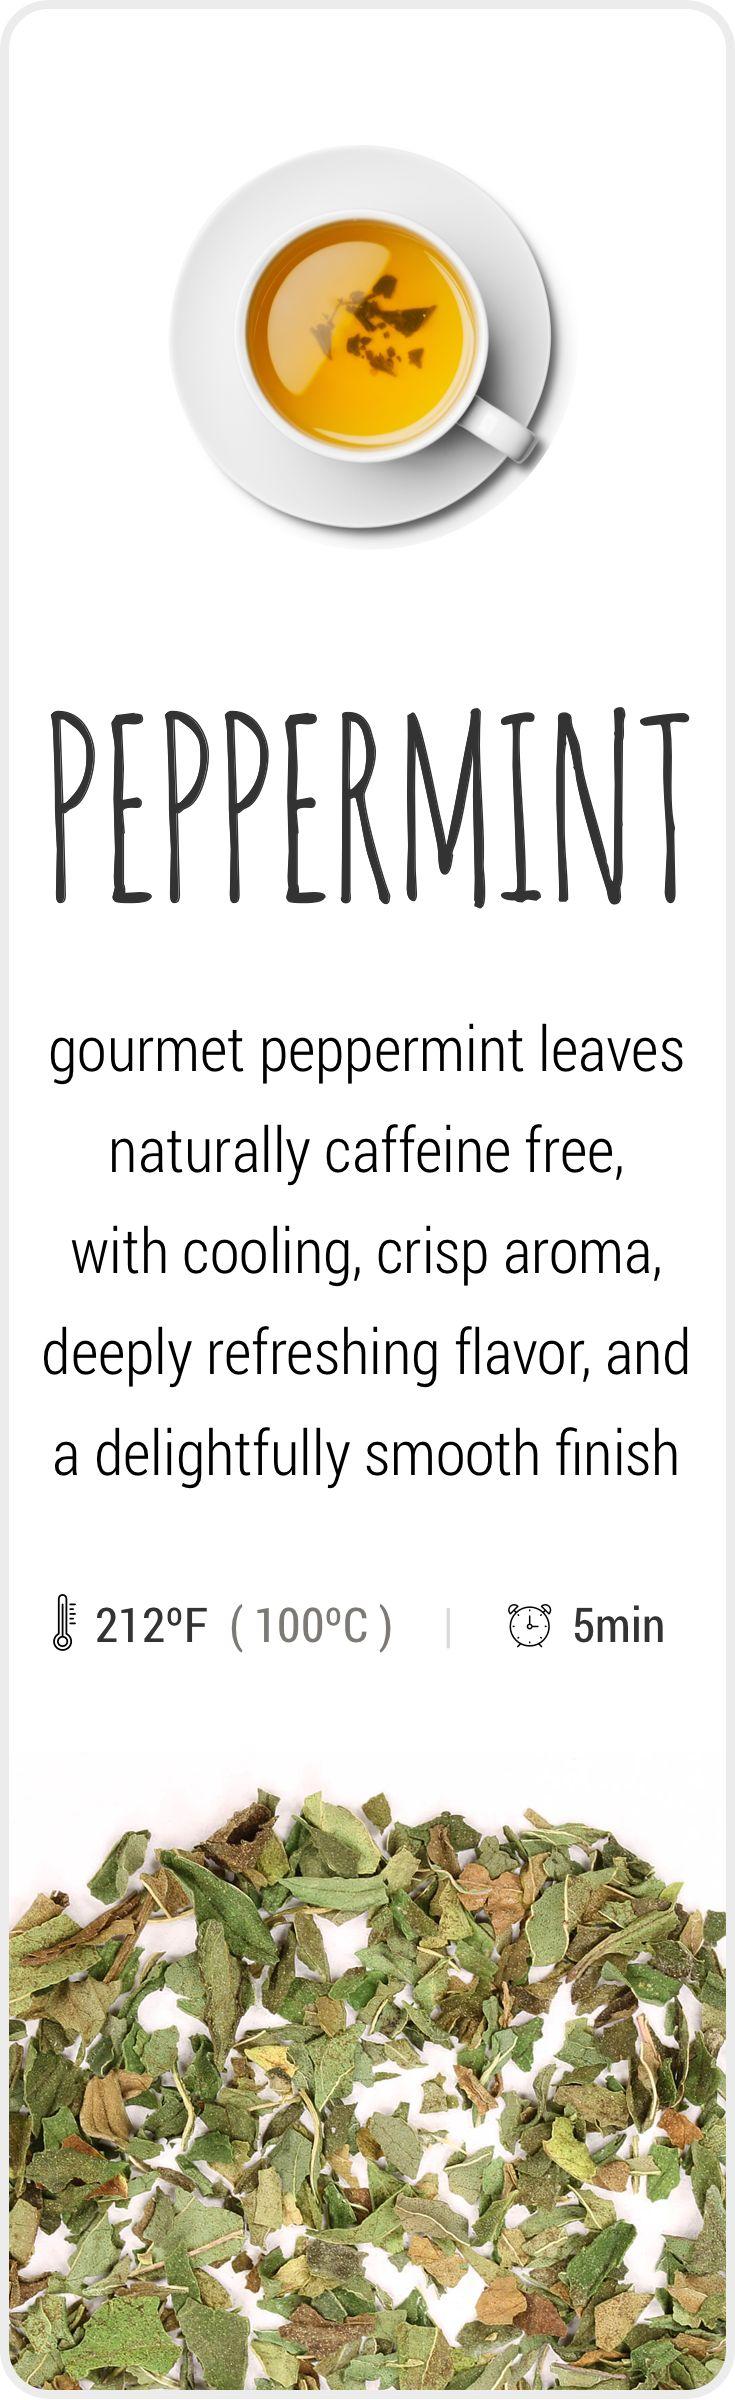 Farm-fresh herbal Peppermint tea from Oregon, USA.